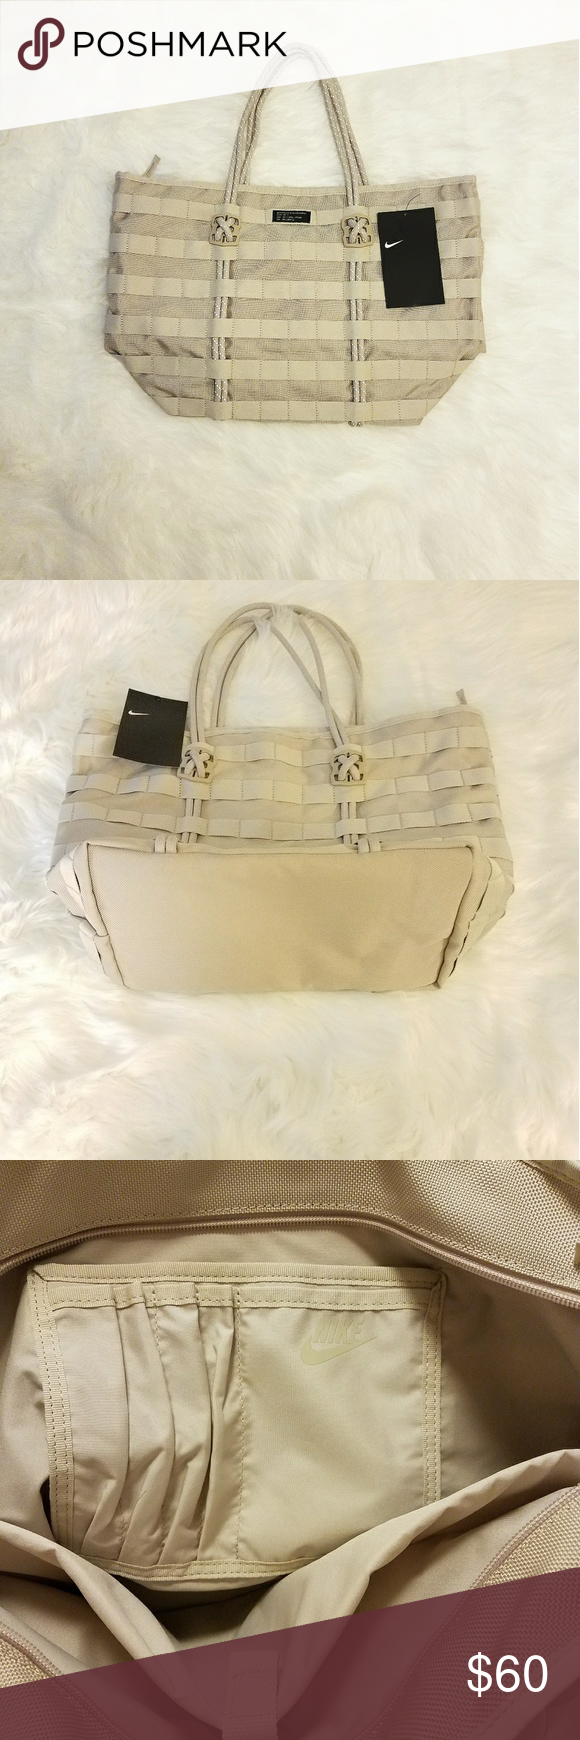 b91454bebd0c Spotted while shopping on Poshmark  NWT Nike Sportswear AF1 Tote Bag!   poshmark  fashion  shopping  style  Nike  Handbags